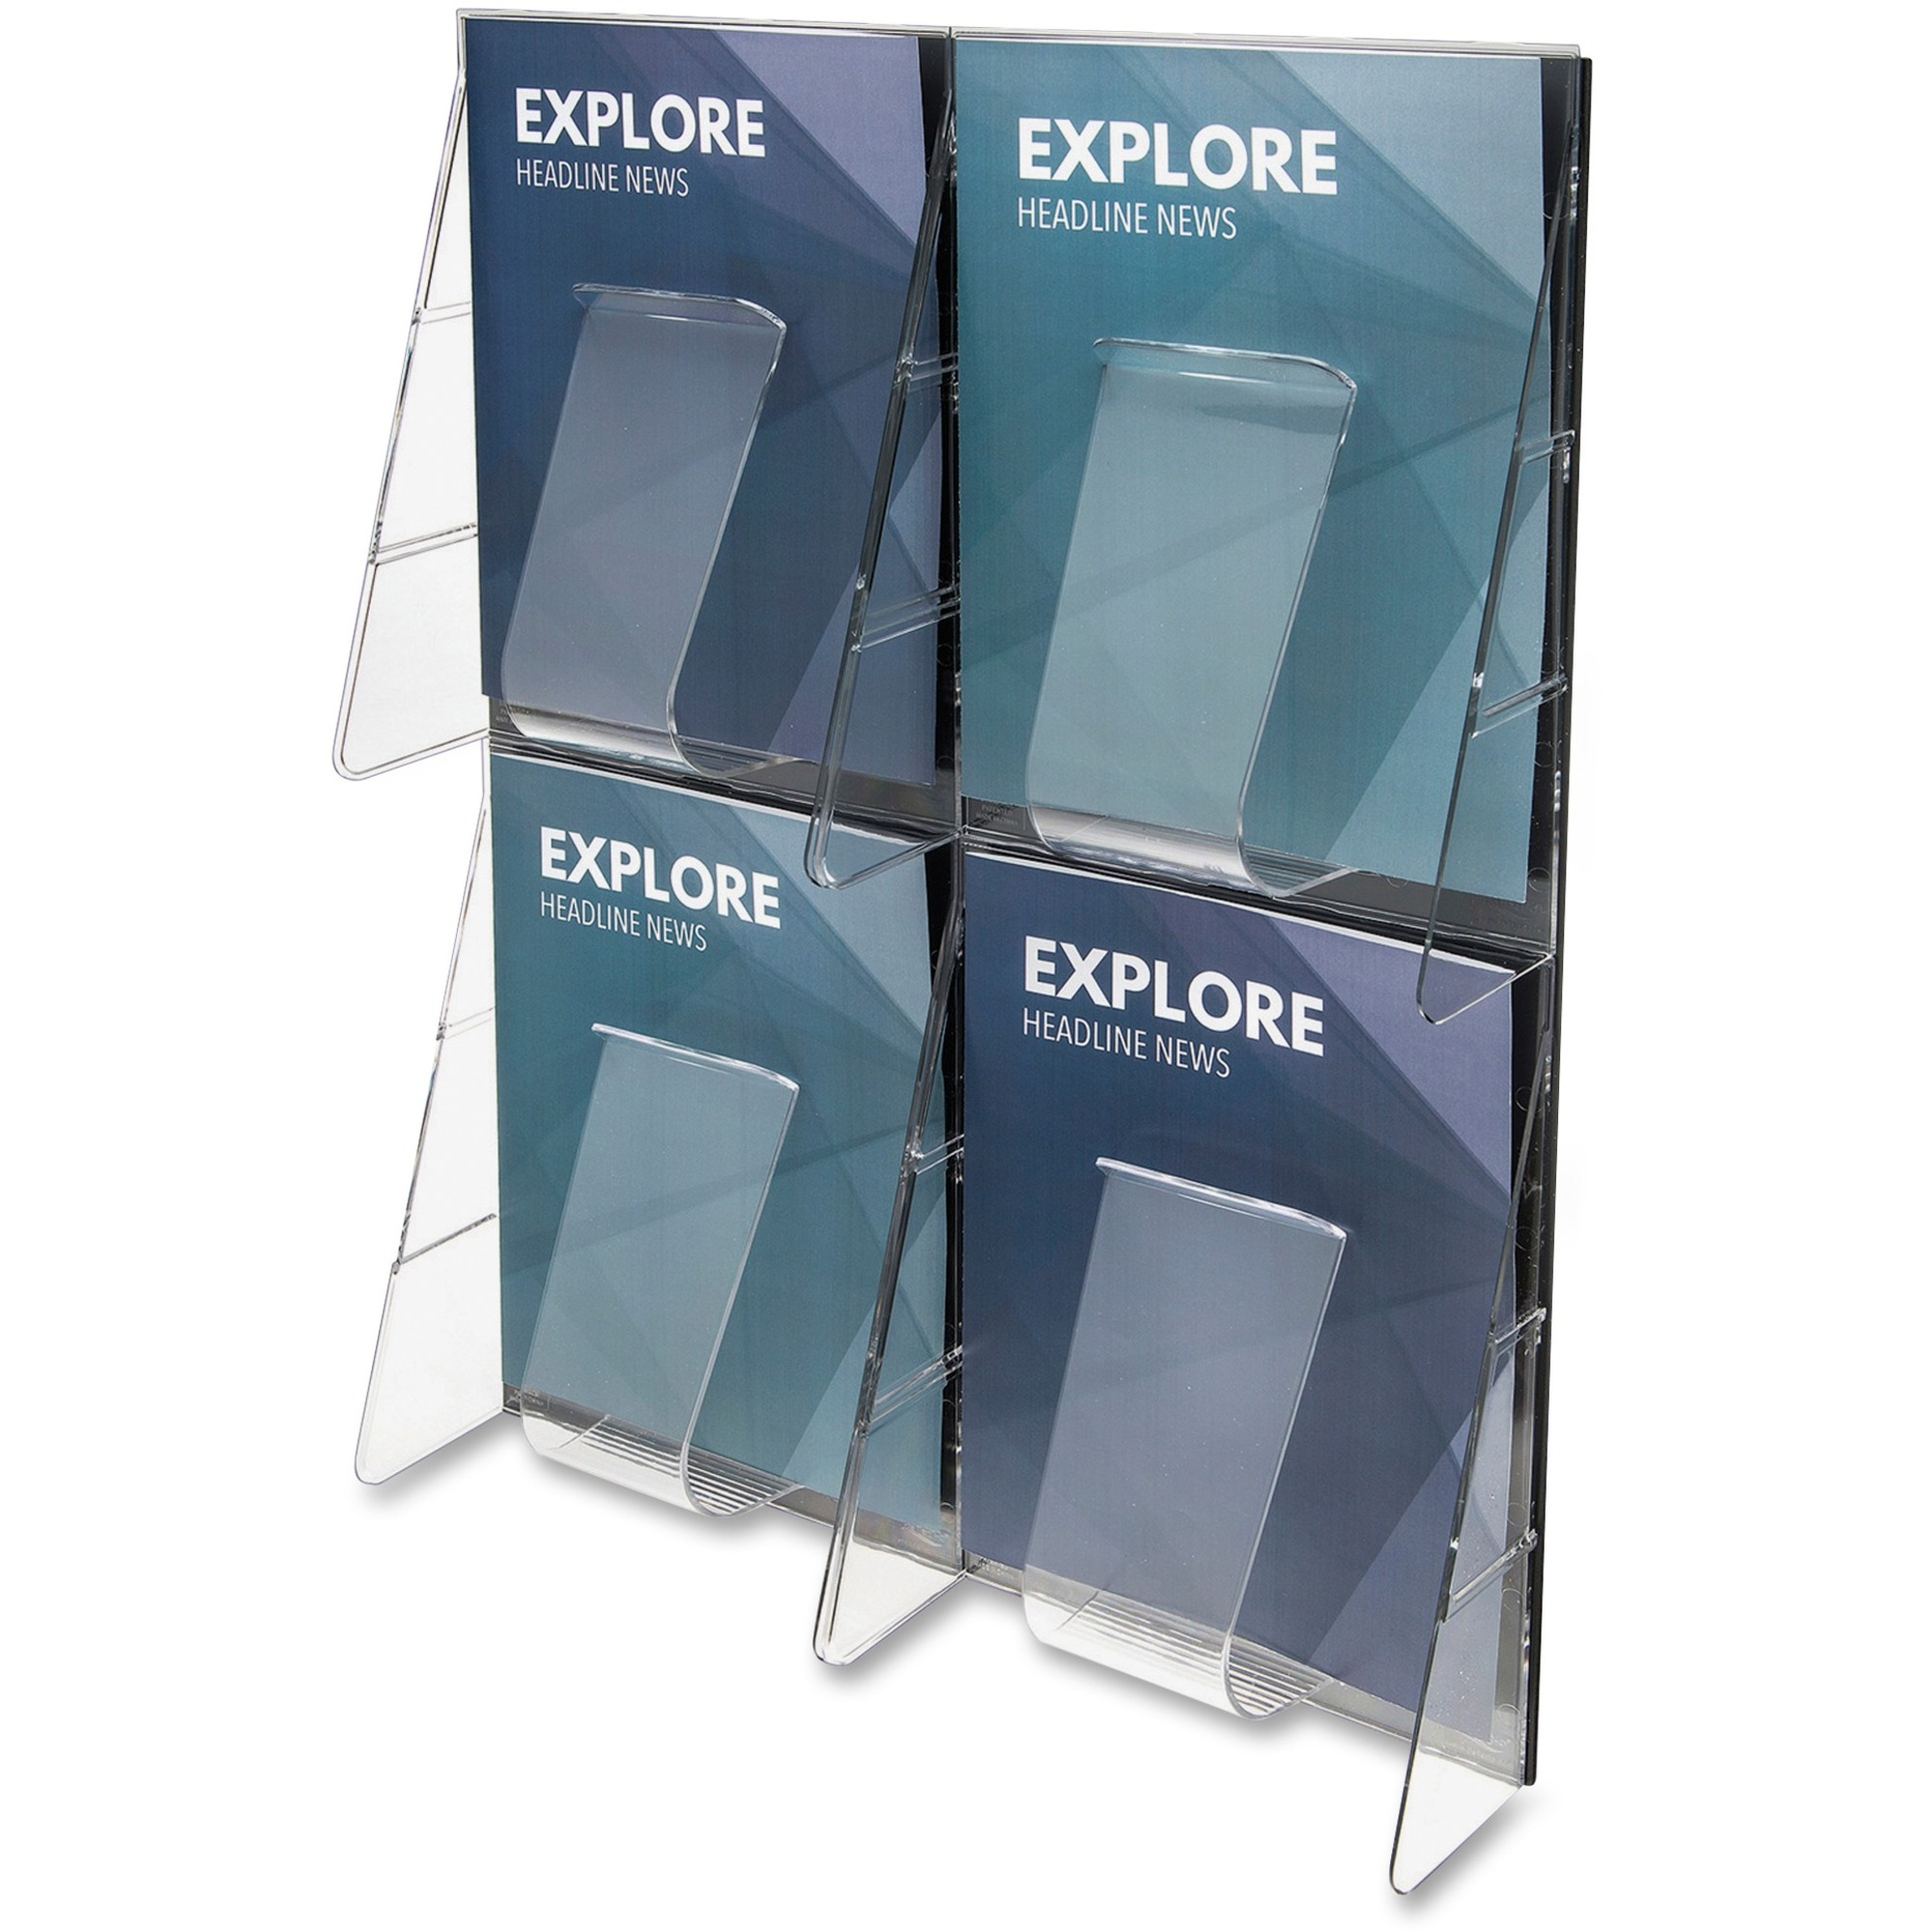 is rack magazine phamphet literature mount cascade itm image loading brochure display wall holder